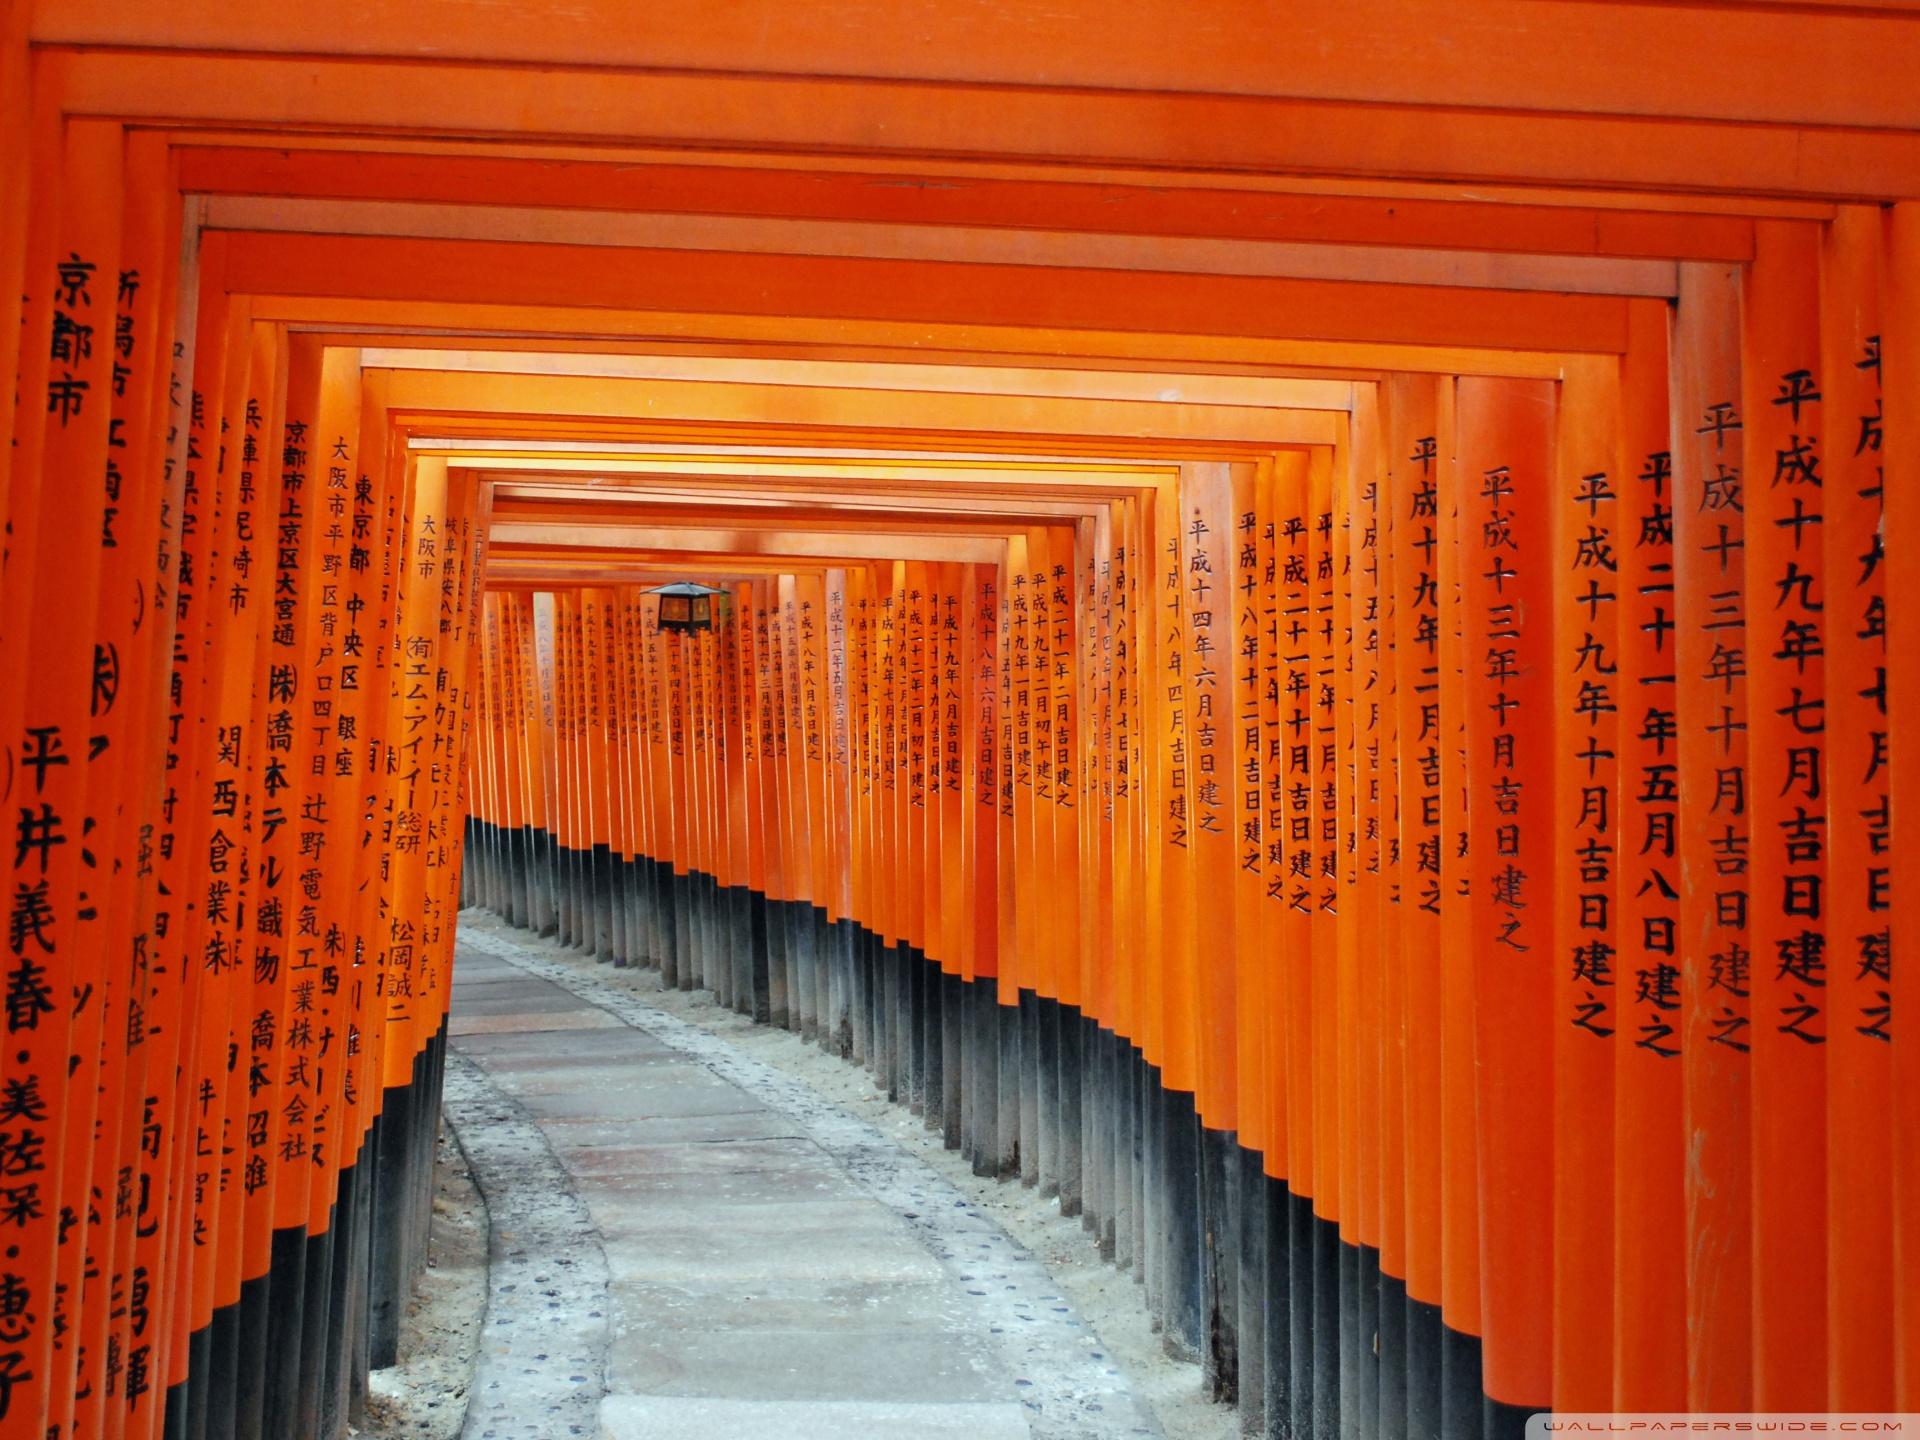 Fushimi Inari Taisha Kyoto Japan 4K HD Desktop Wallpaper for 1920x1440